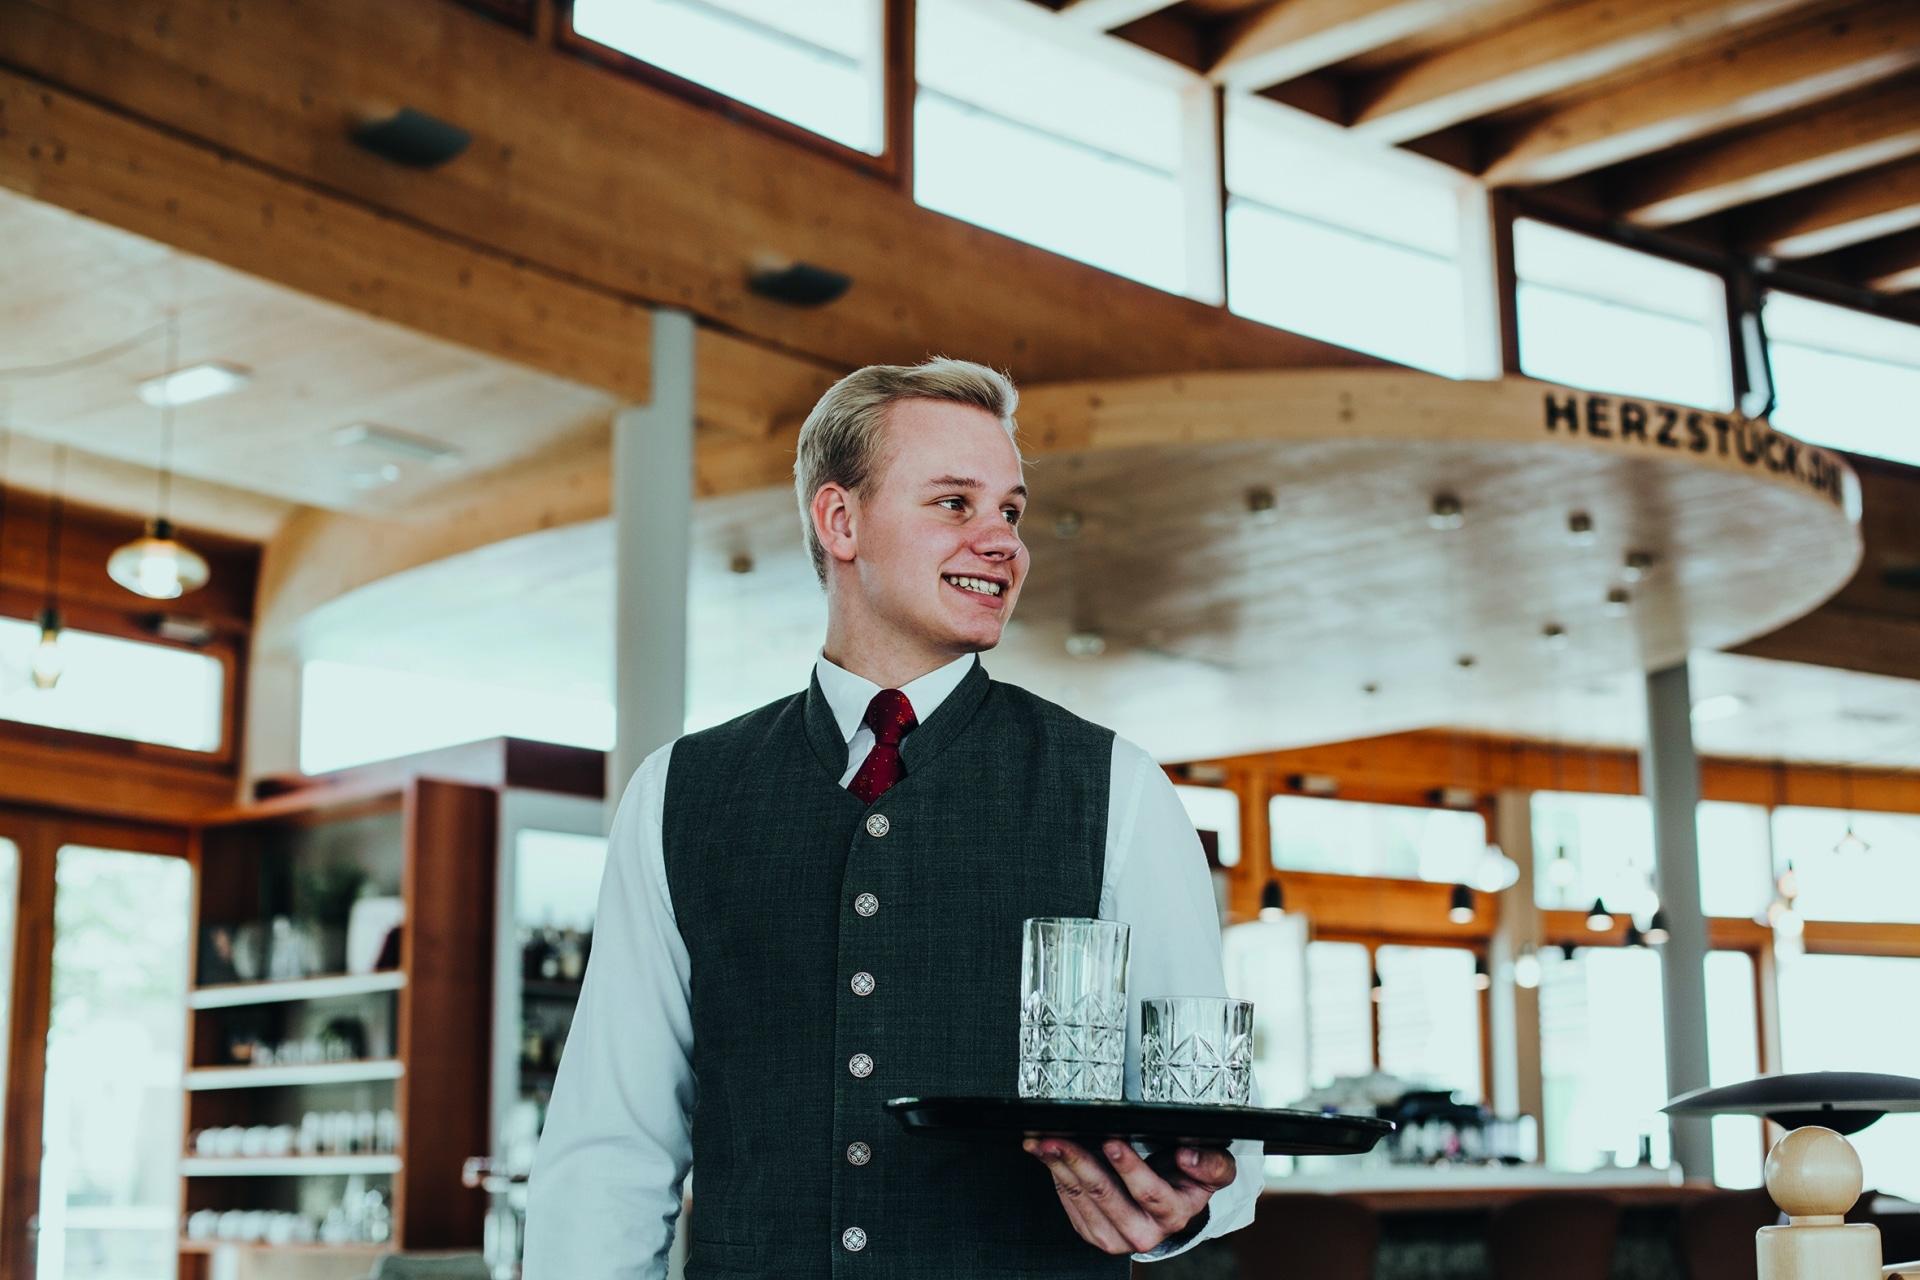 Hotelservice in der Wasnerin in Bad Aussee